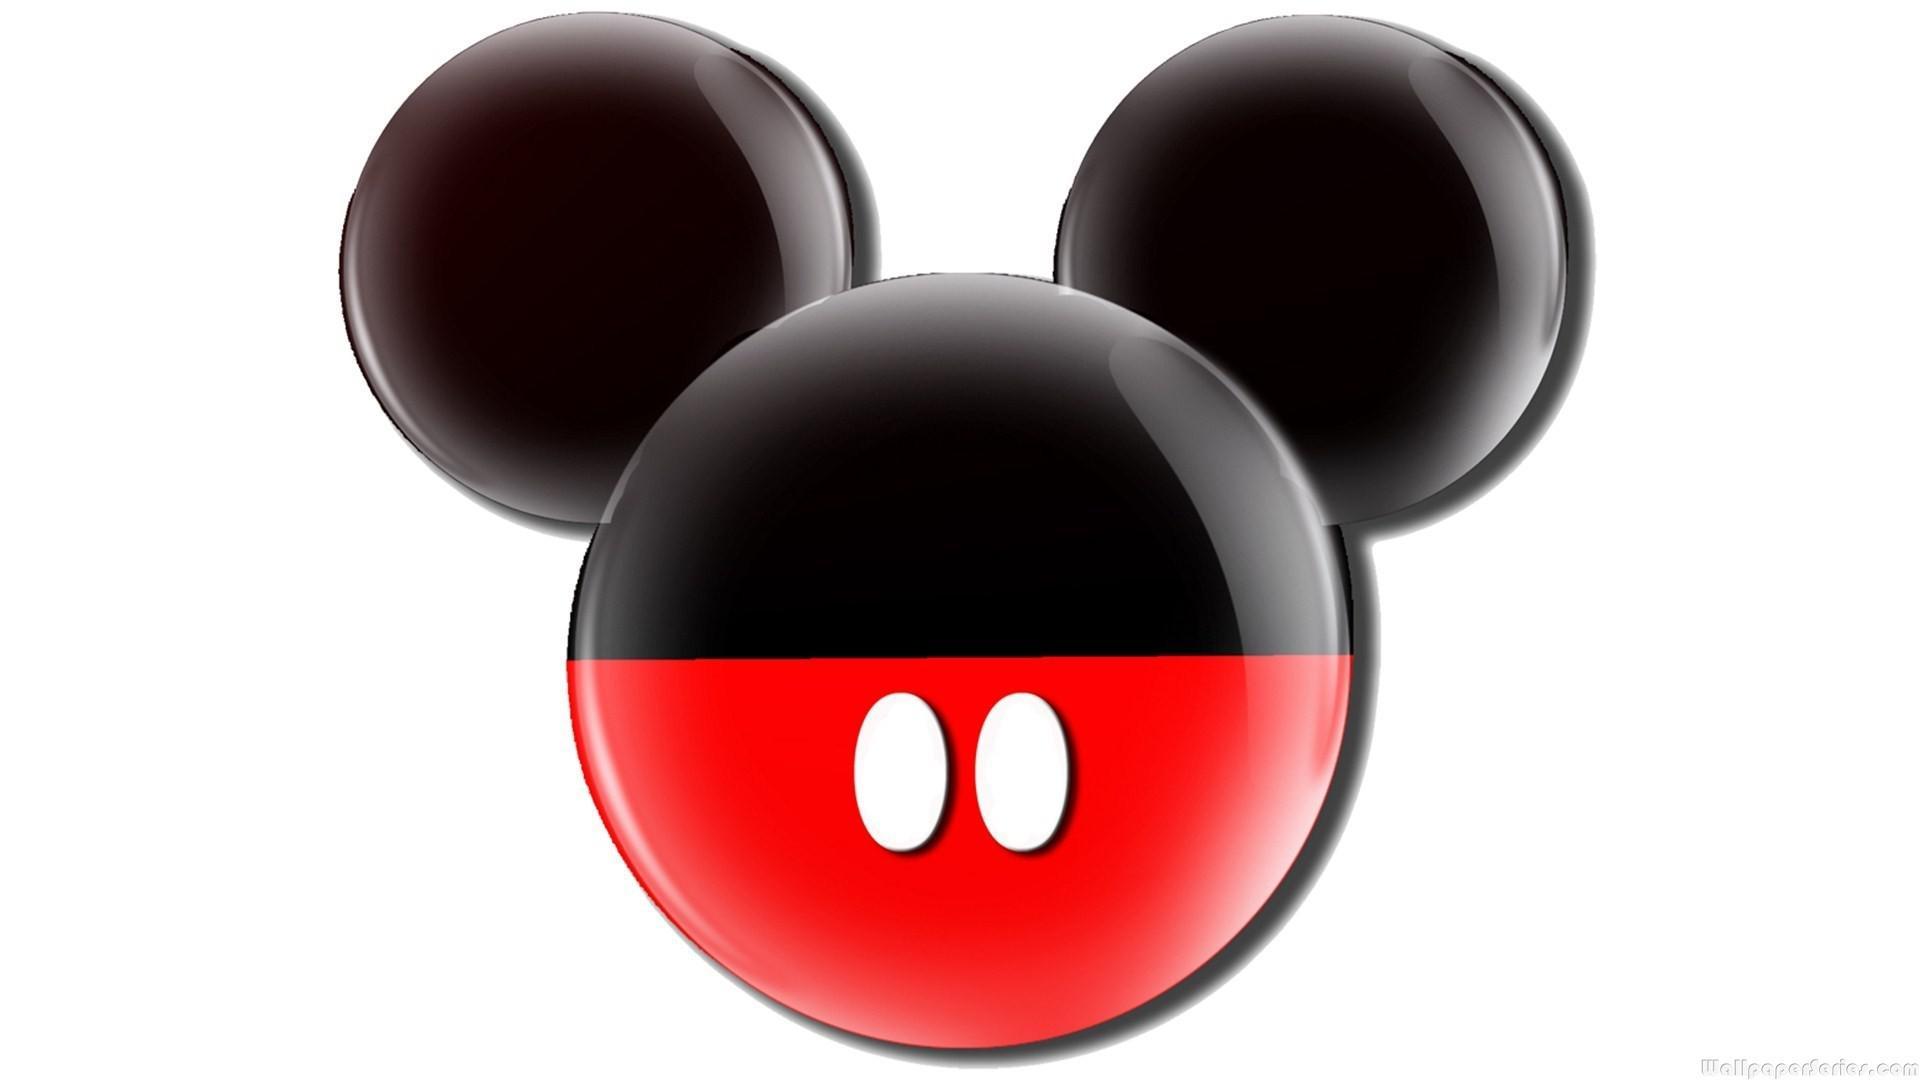 Download: Mickey Mouse Head Desktop